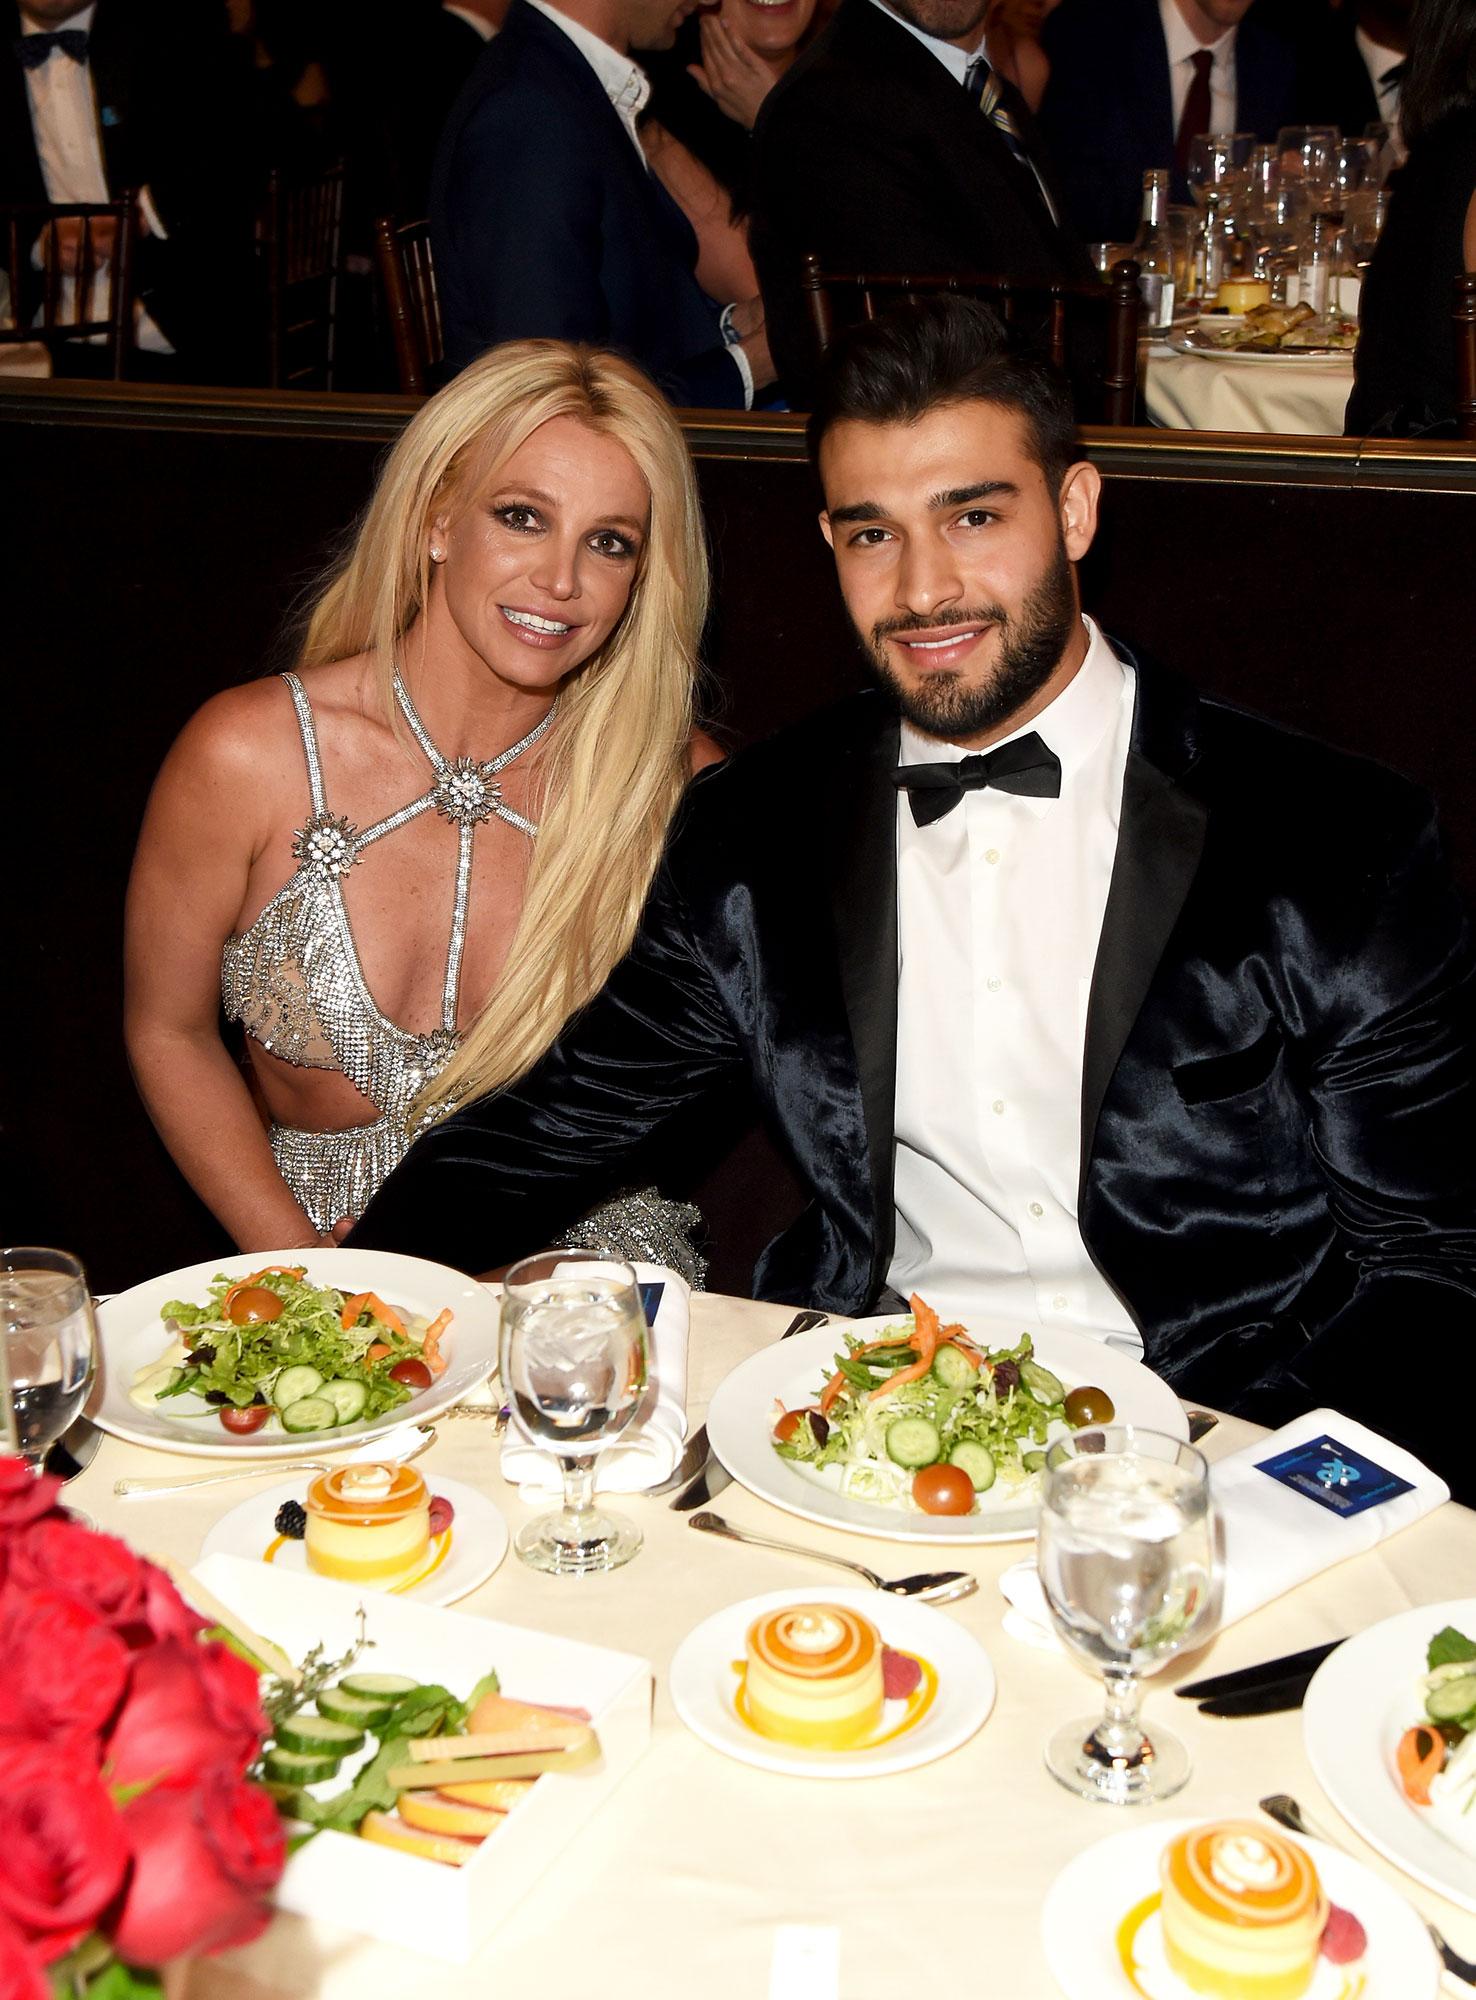 Britney Spears has an office romance